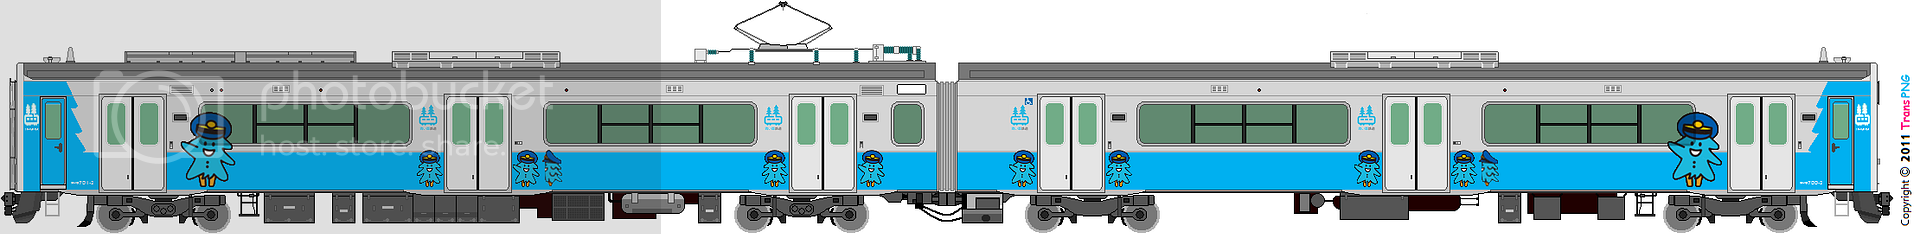 Train 2275